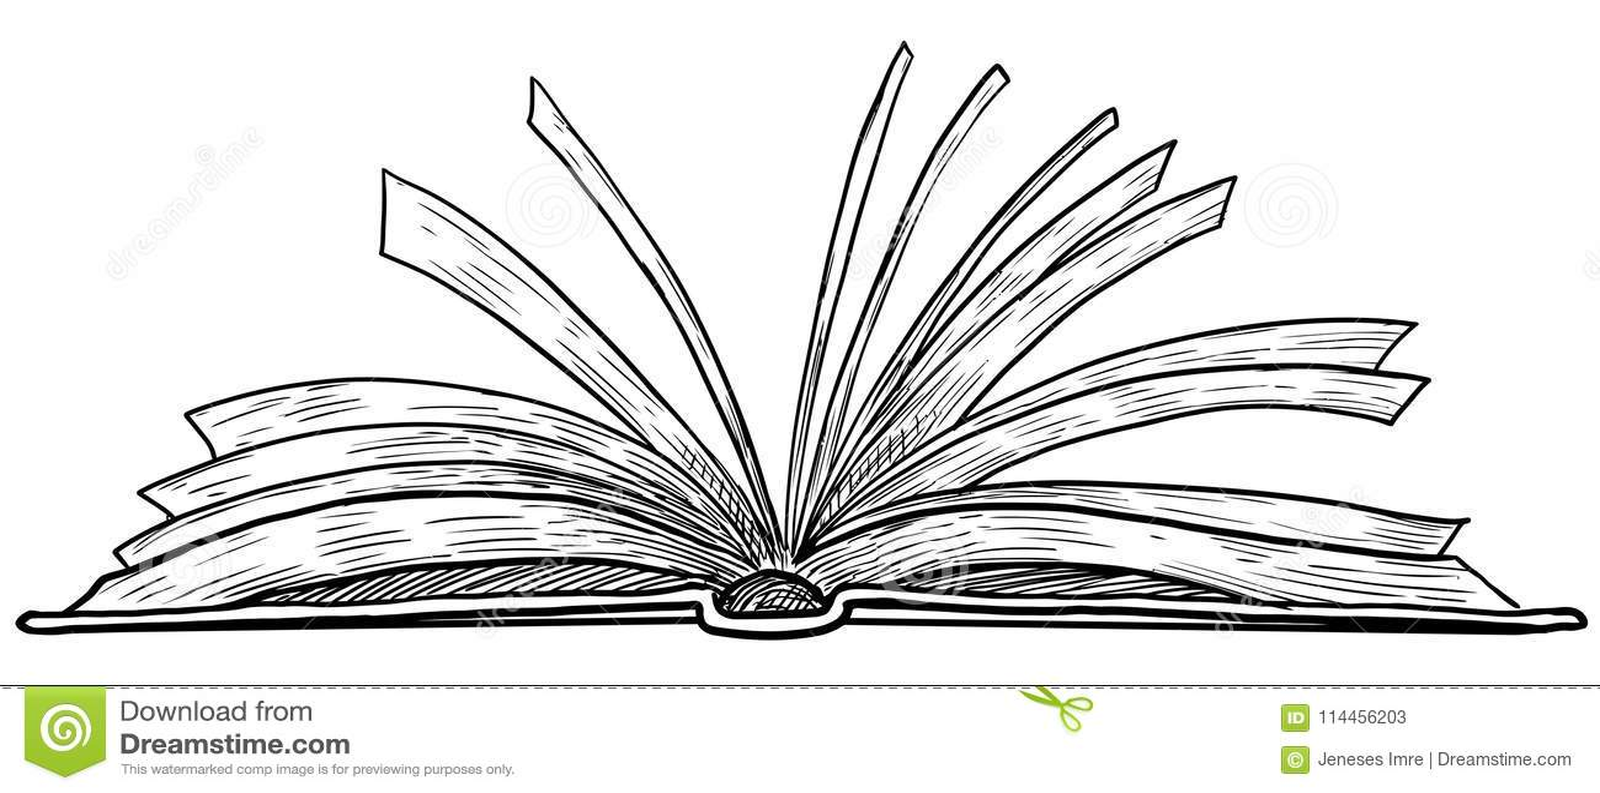 Open Book Illustration, Drawing, Engraving, Ink, Line Art ...